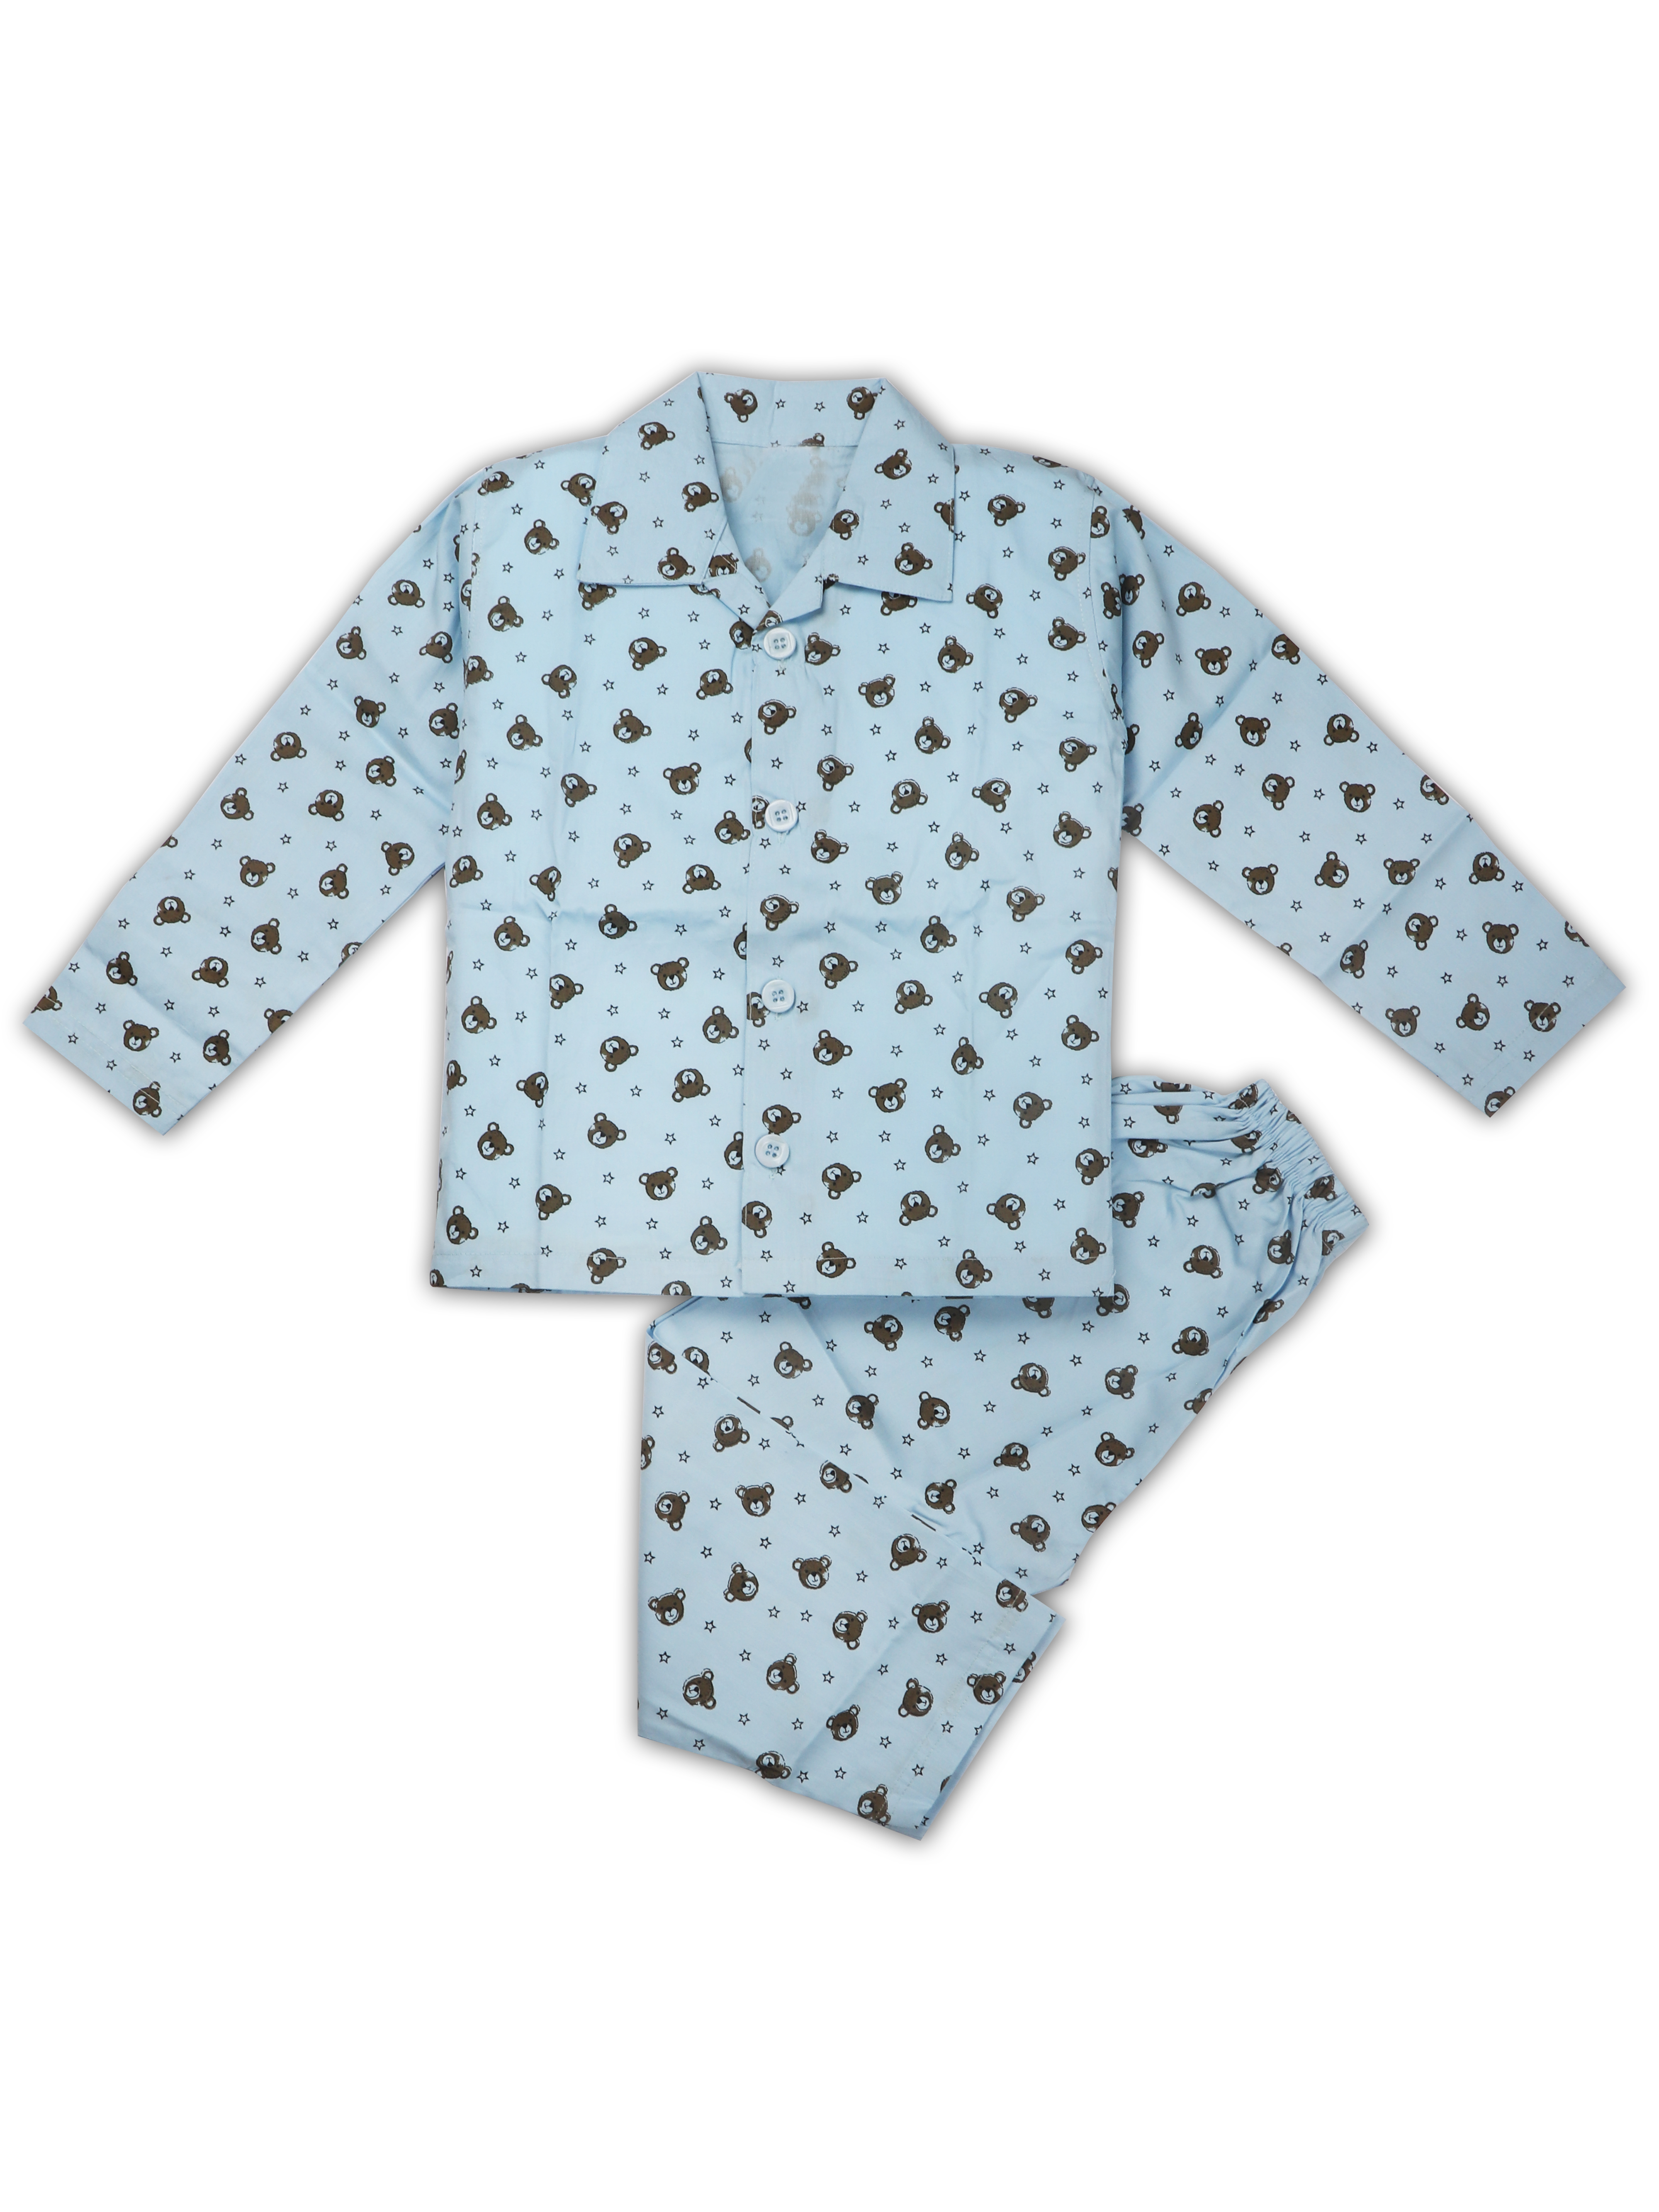 AAAKAR | AAAKAR Full Sleeves Night Suit All Over Print Animal - Blue